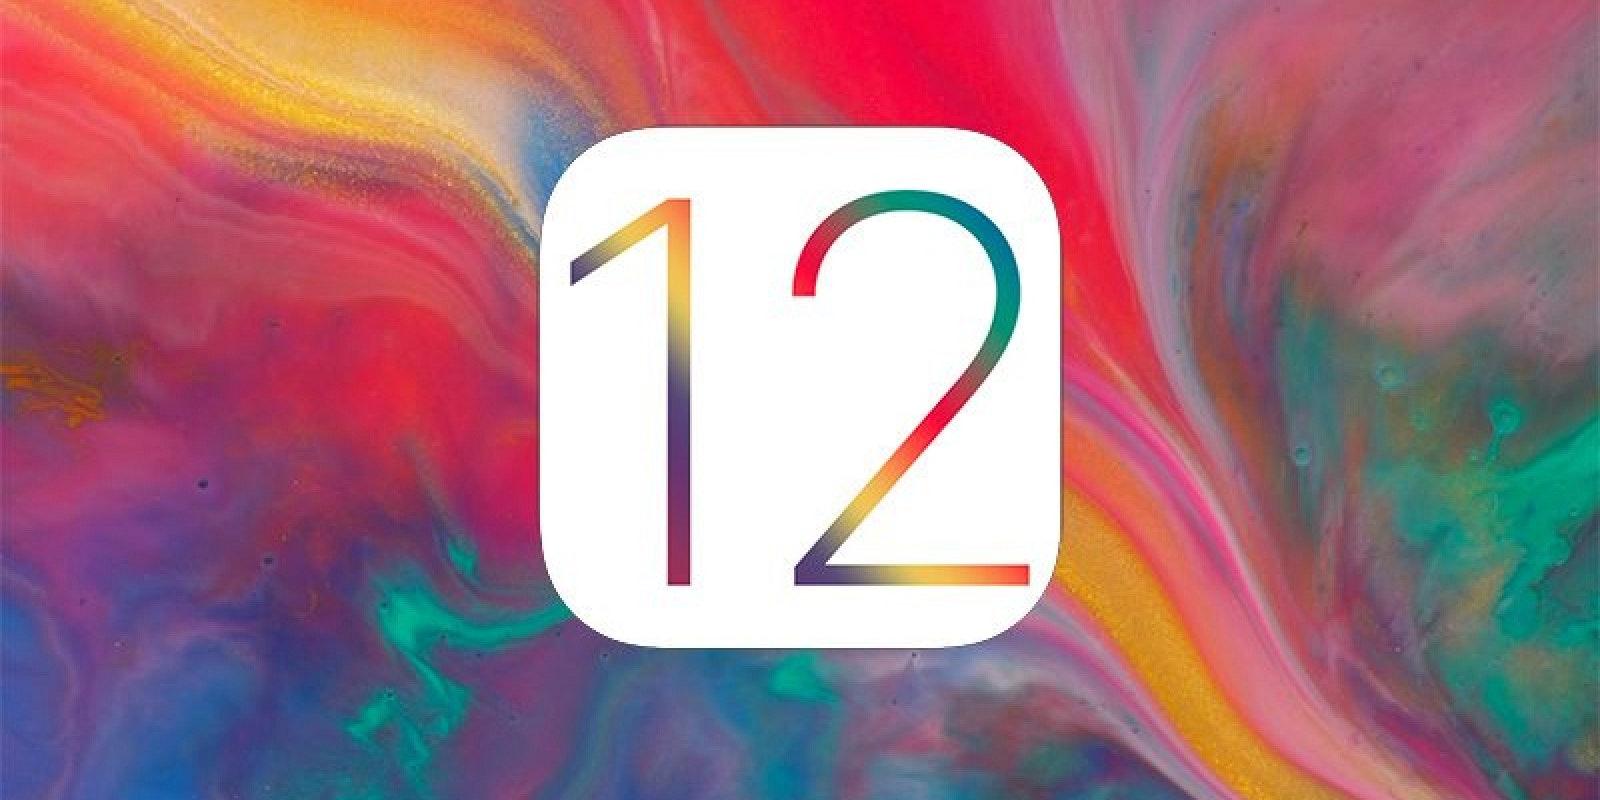 iOS 12 Features: 4 Big Updates Rumored to Hit iPhone X Plus in 2018